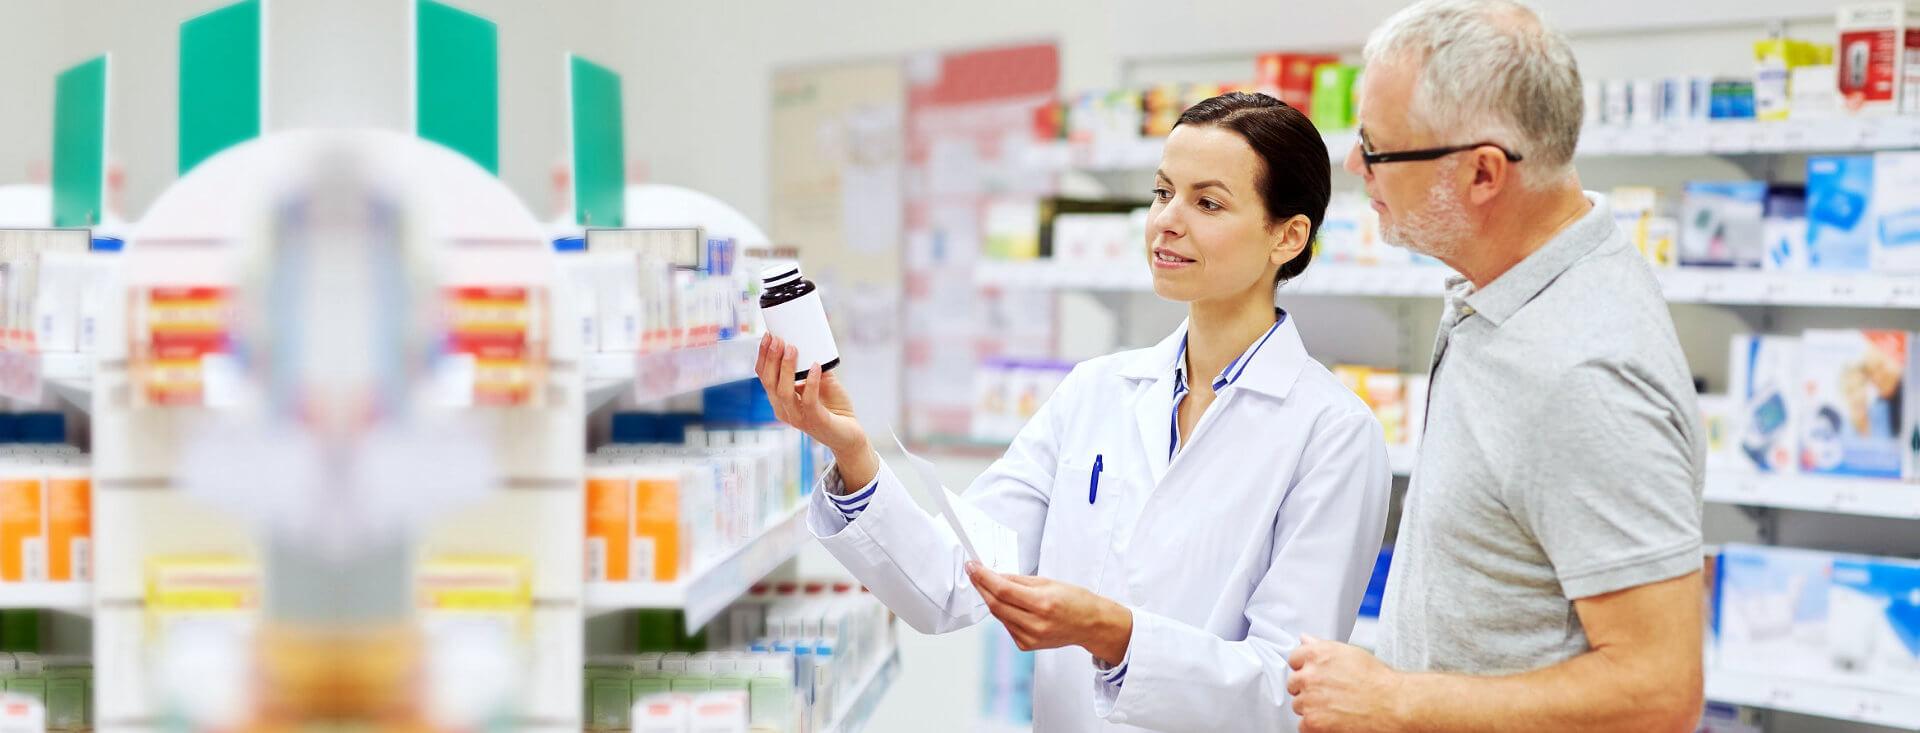 pharmacist assisting a senior man